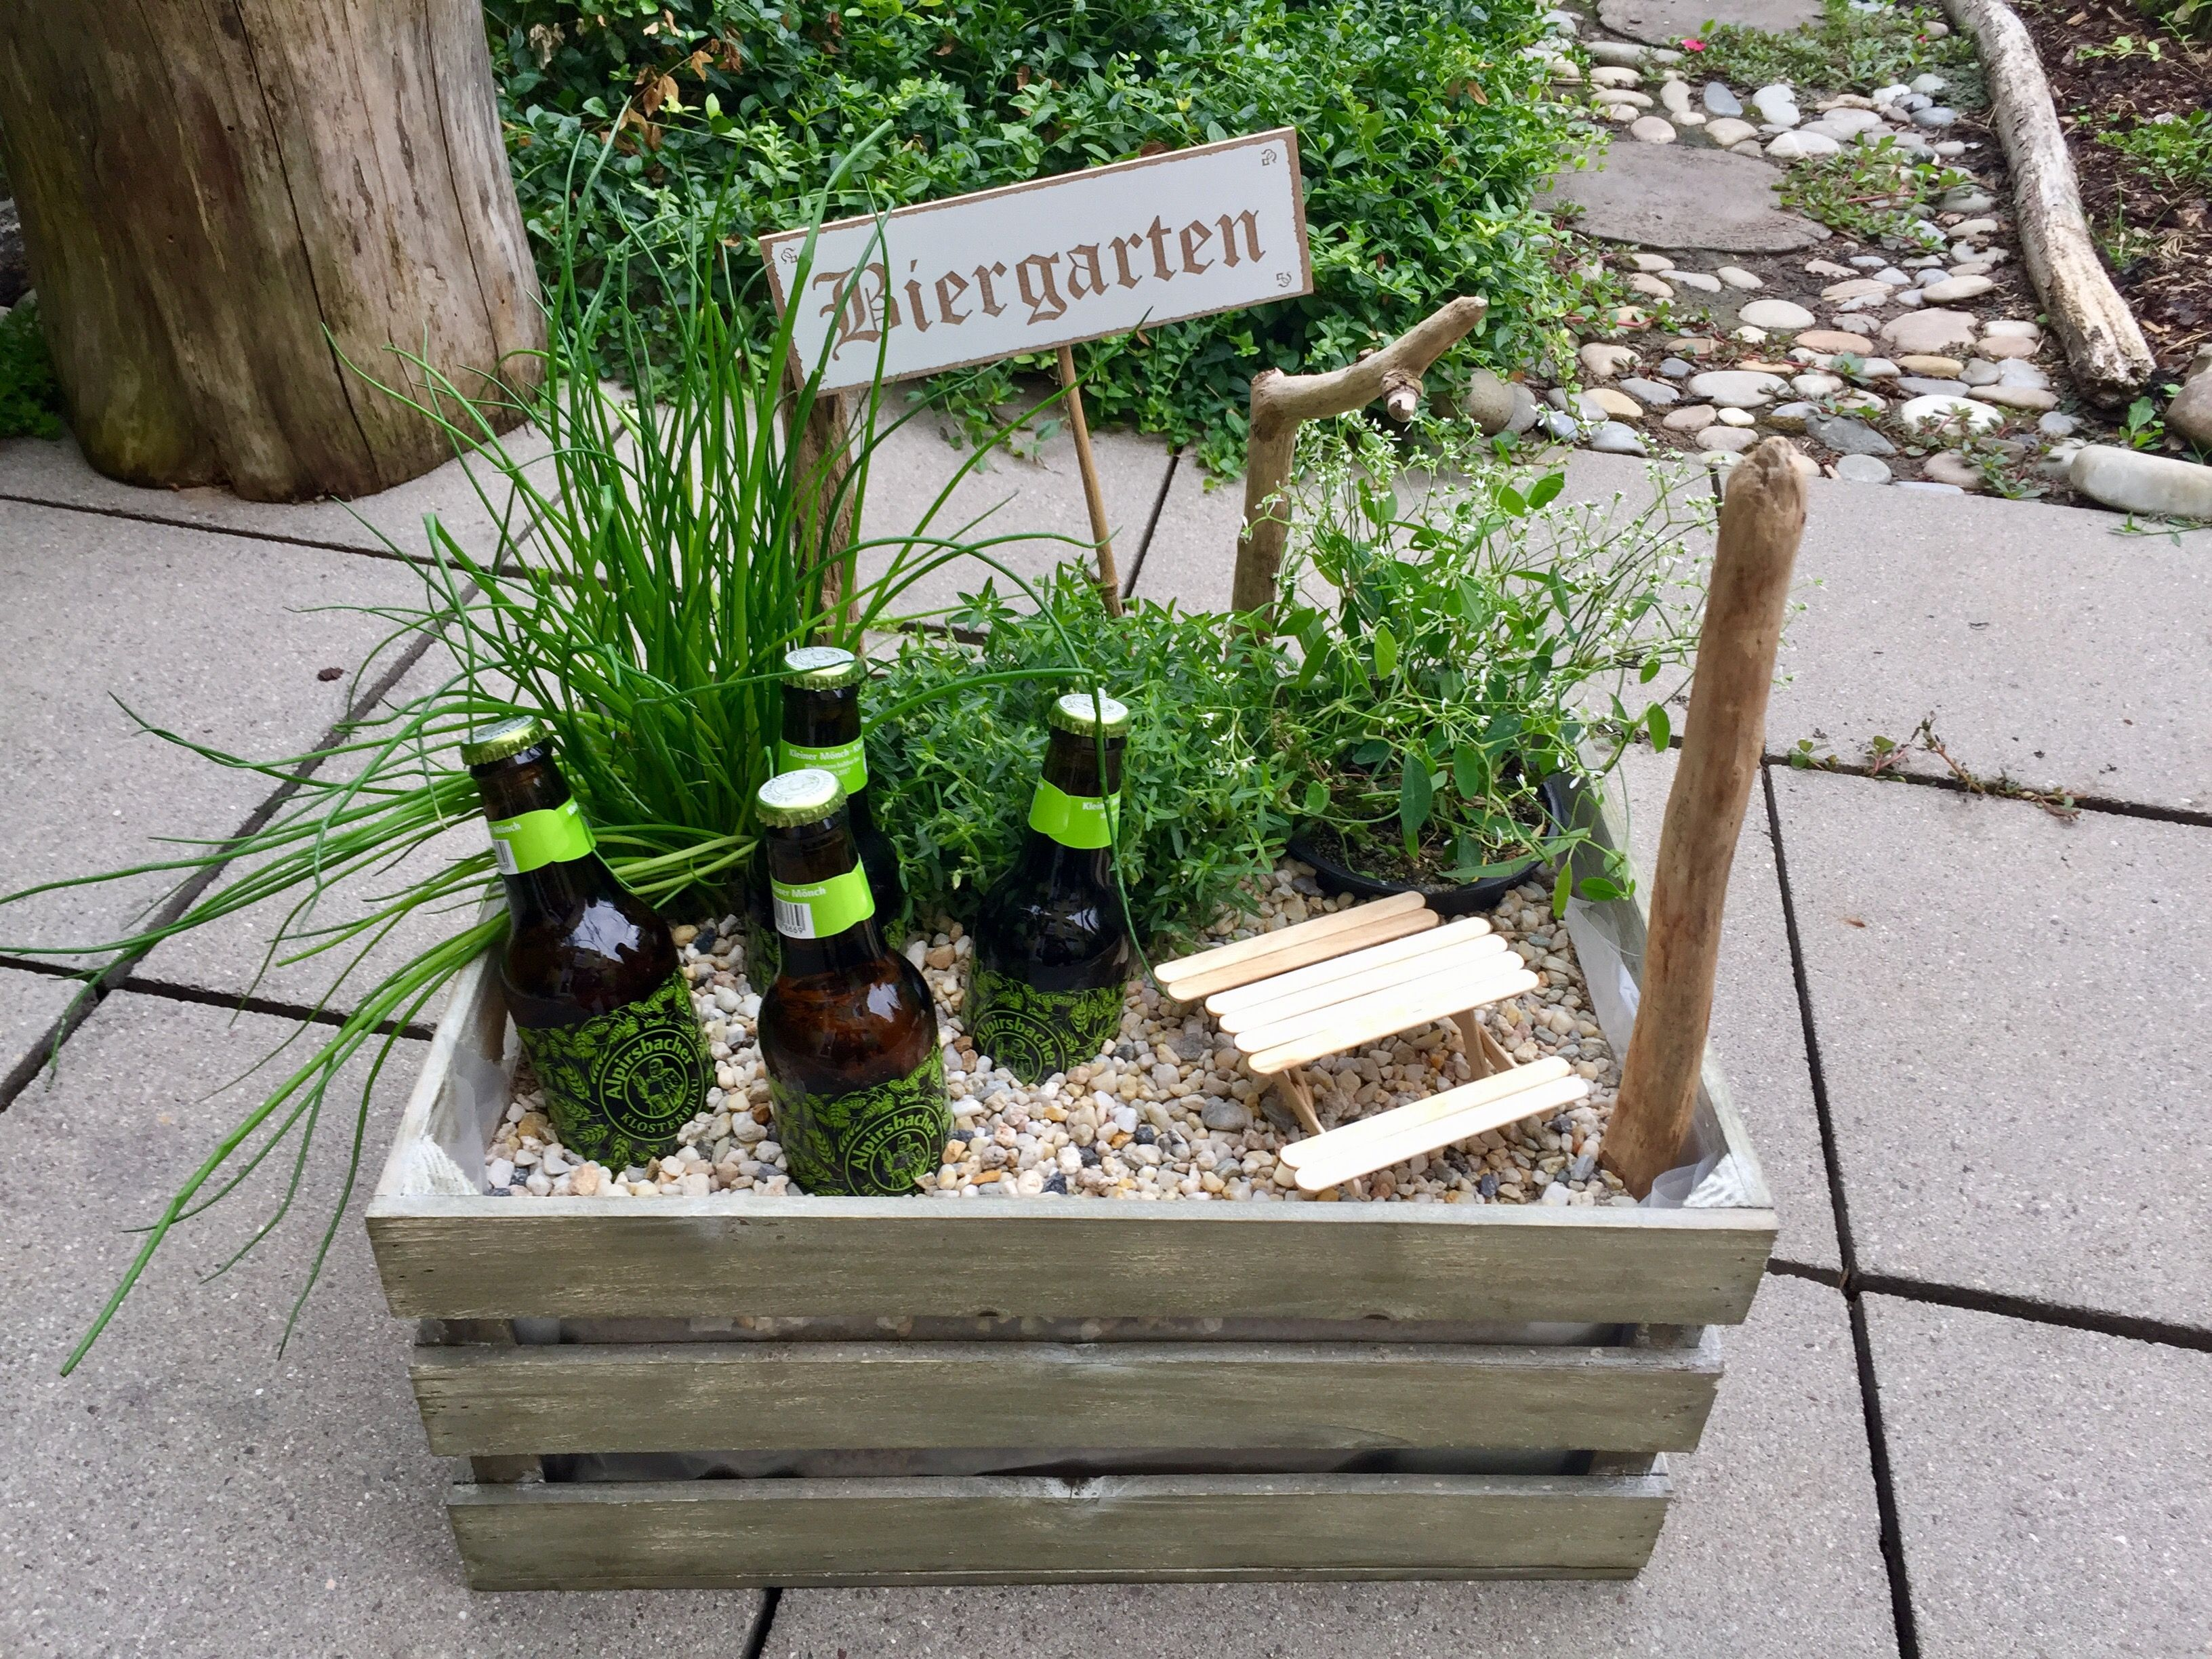 Geschenkideen für Männer - Biergarten basteln Ideen